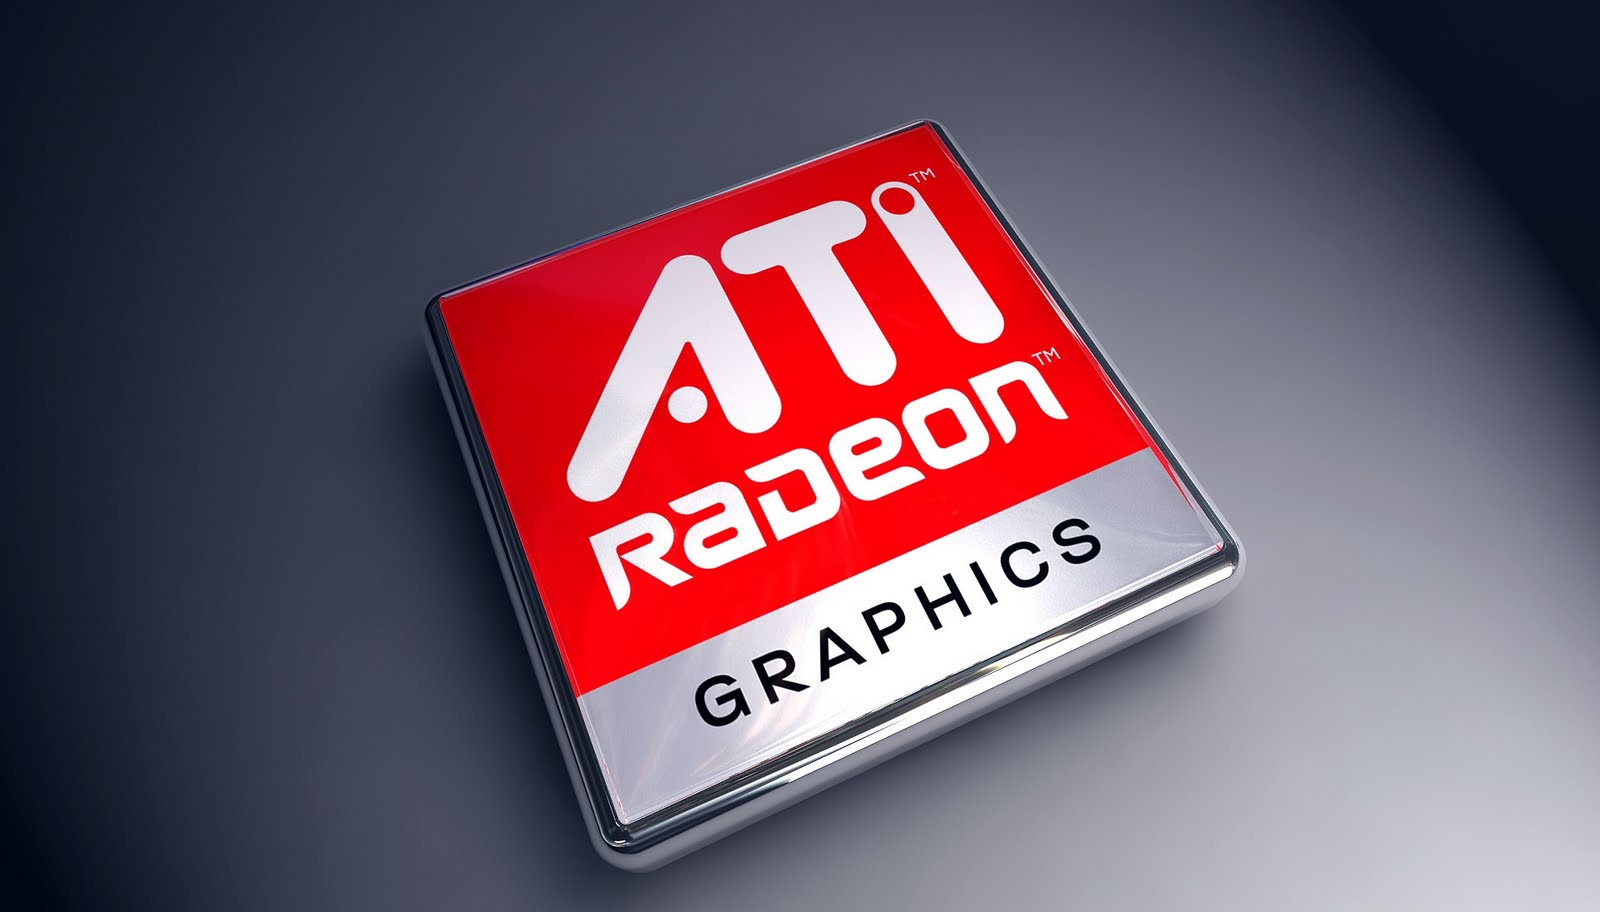 http://1.bp.blogspot.com/_2UbsSBz9ckE/SvXiuW-o7TI/AAAAAAAAAVs/POfzGRRGO1E/s1600/ati_logo_hd_wallpaper_radeon.jpg